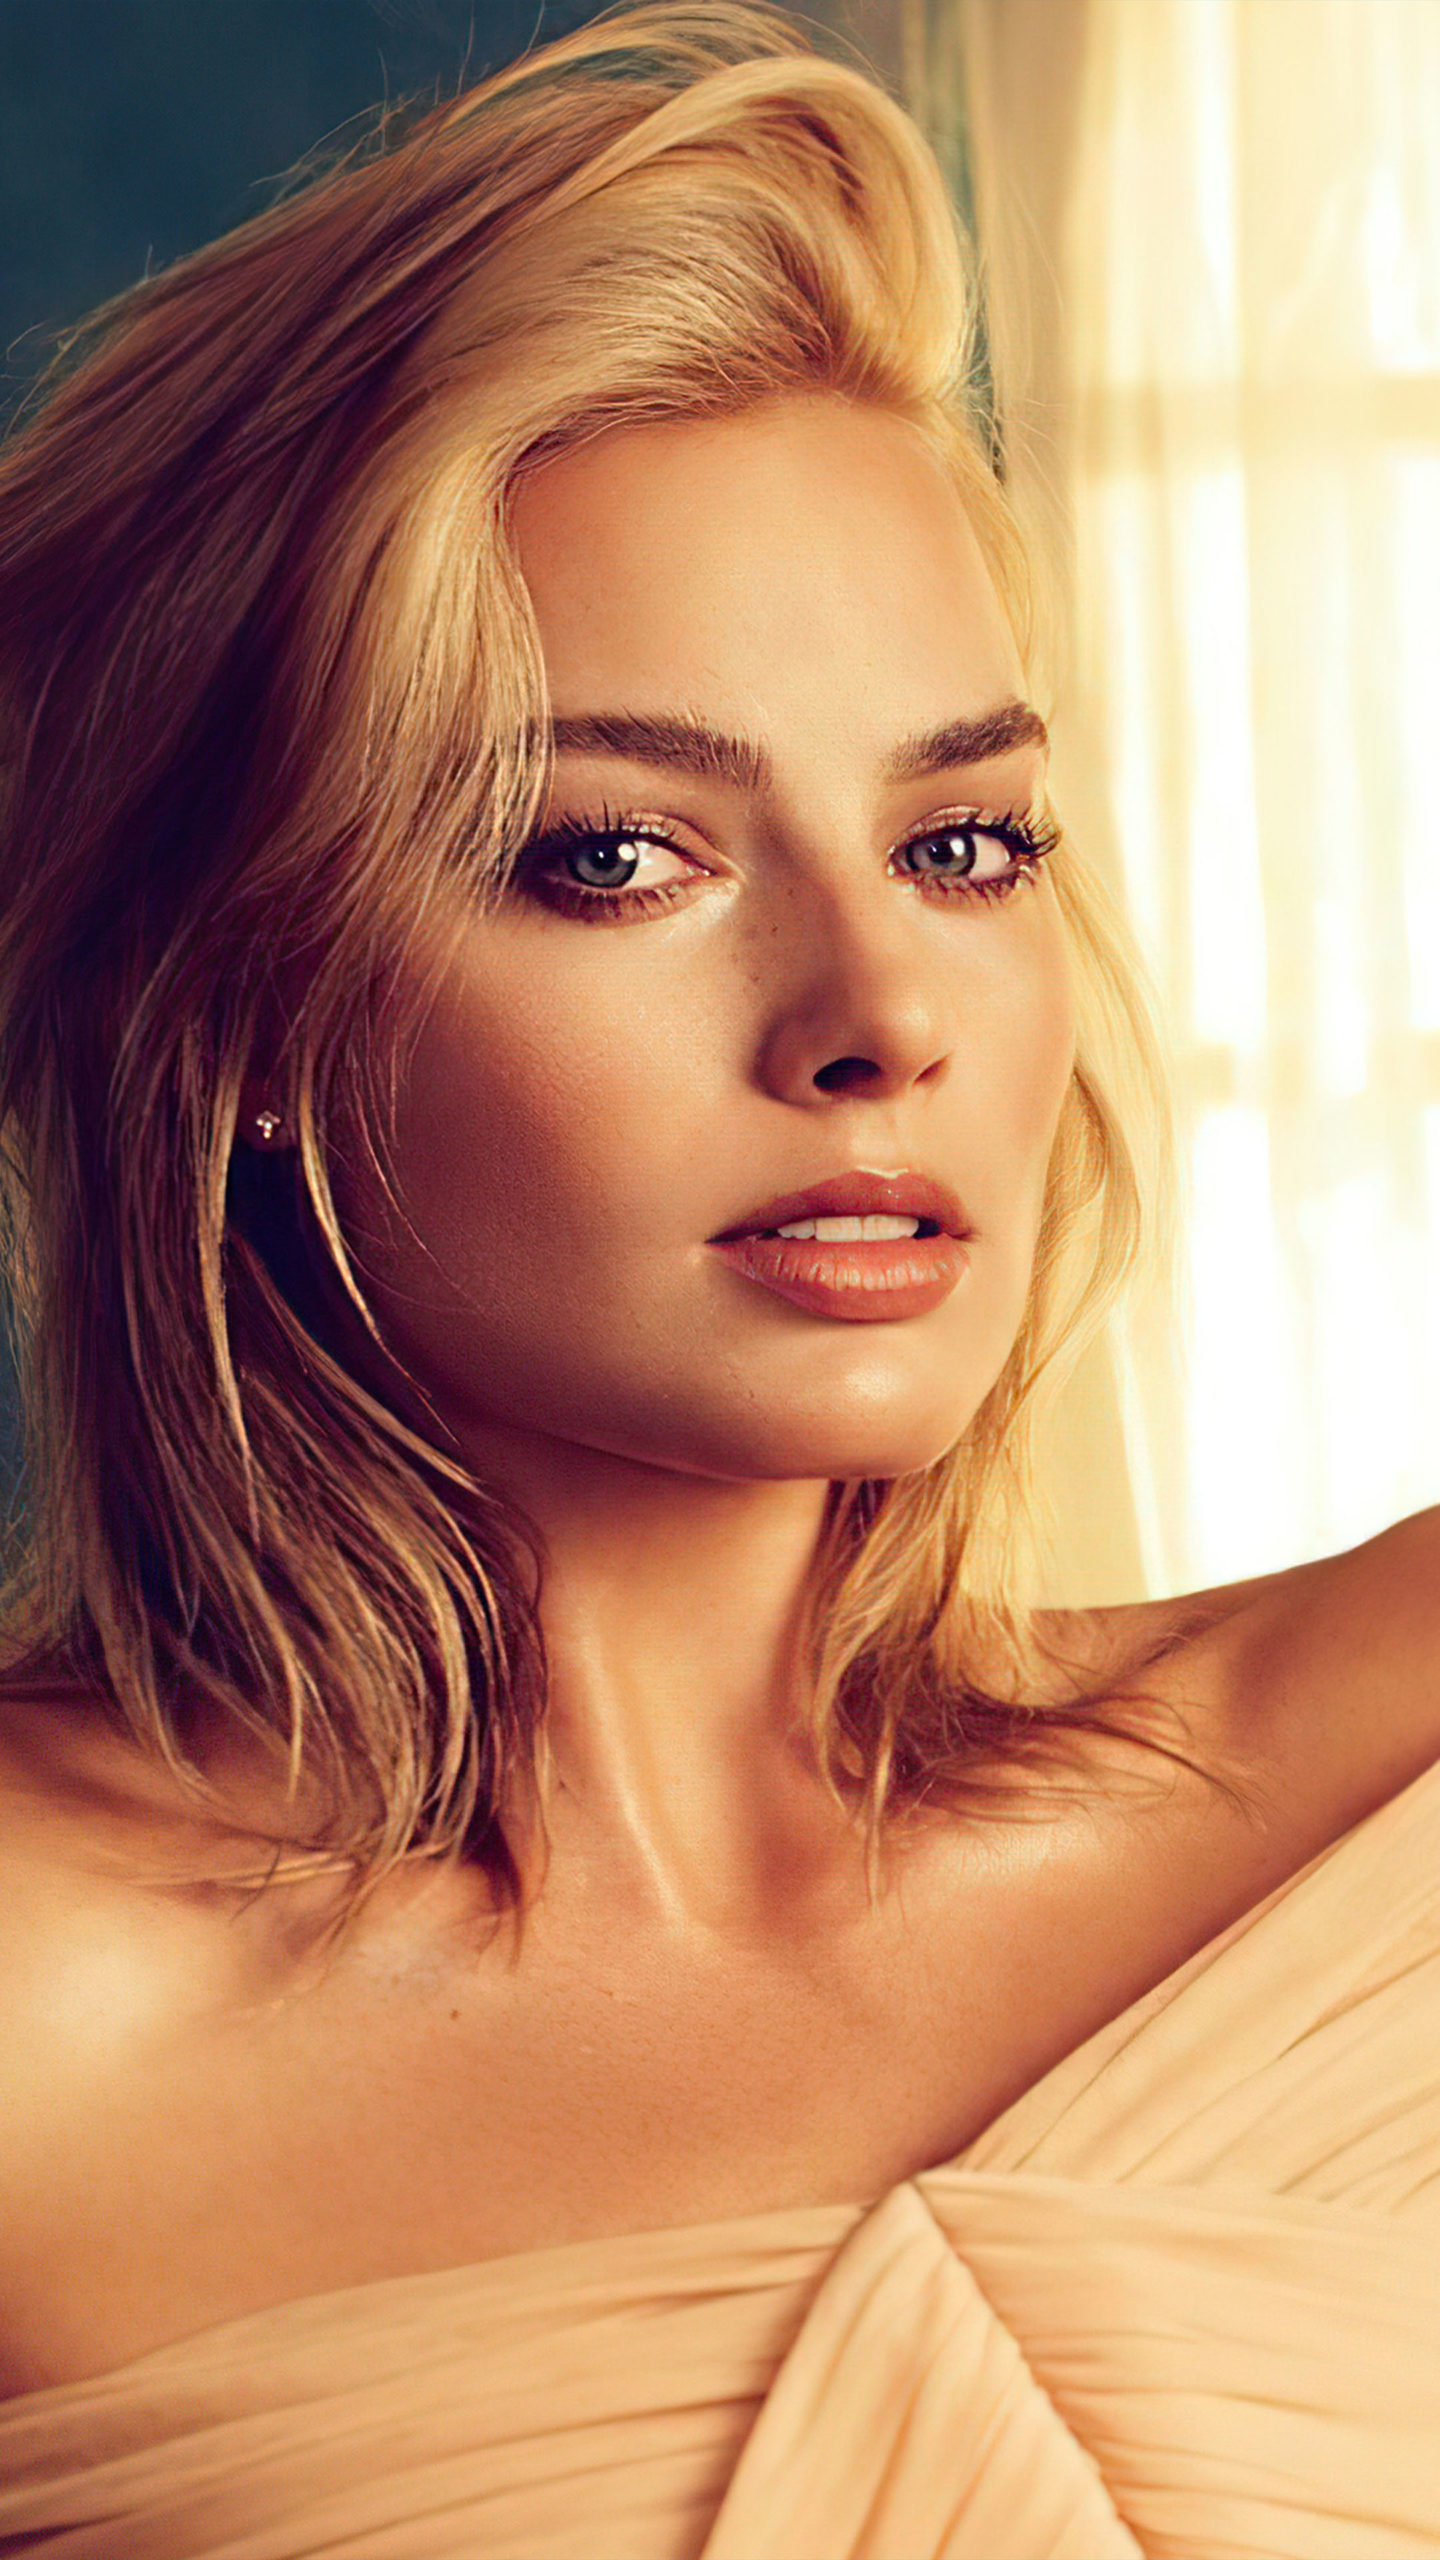 Actress Margot Robbie Blonde 2020 Photoshoot 4K Ultra HD ...